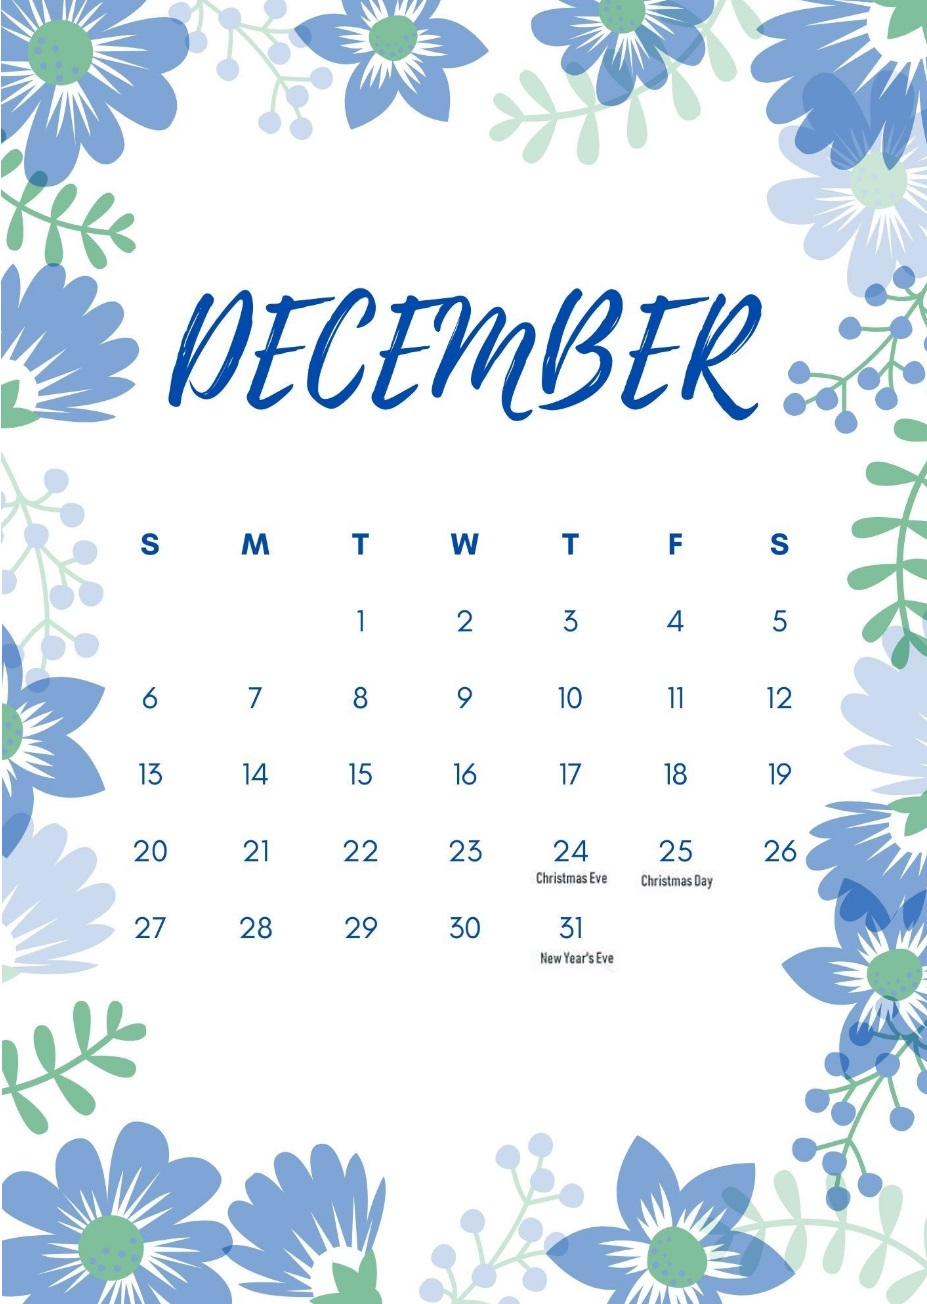 Floral December 2020 Holidays Calendar